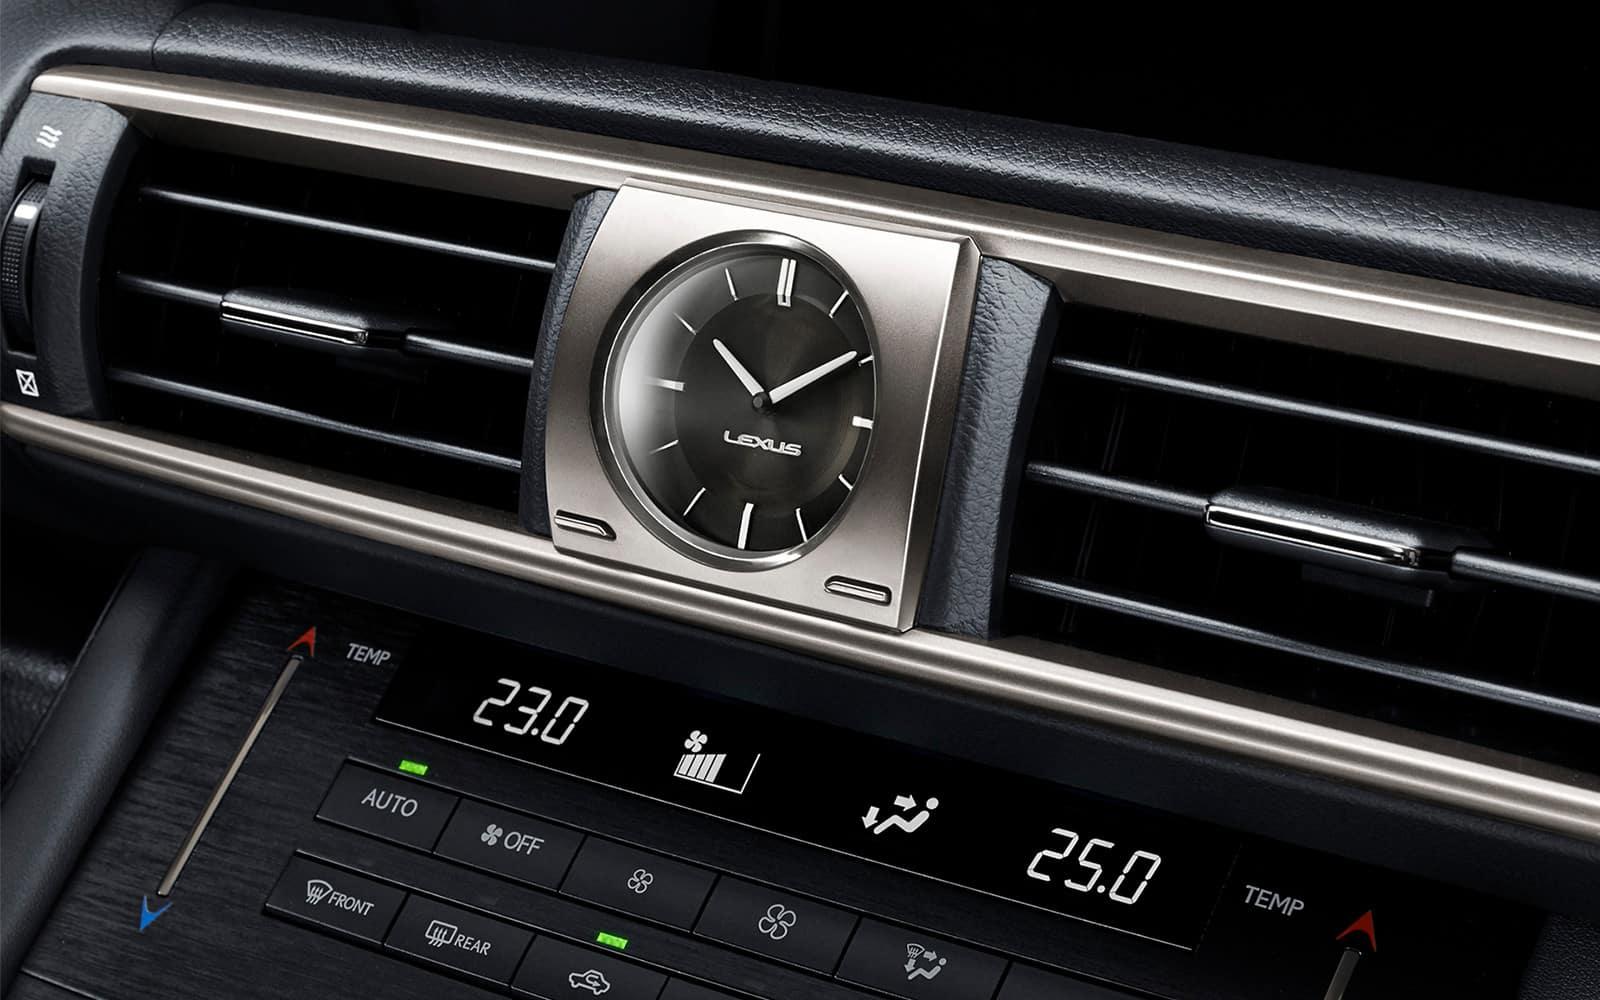 lexus-2018-is-analog-clock-l